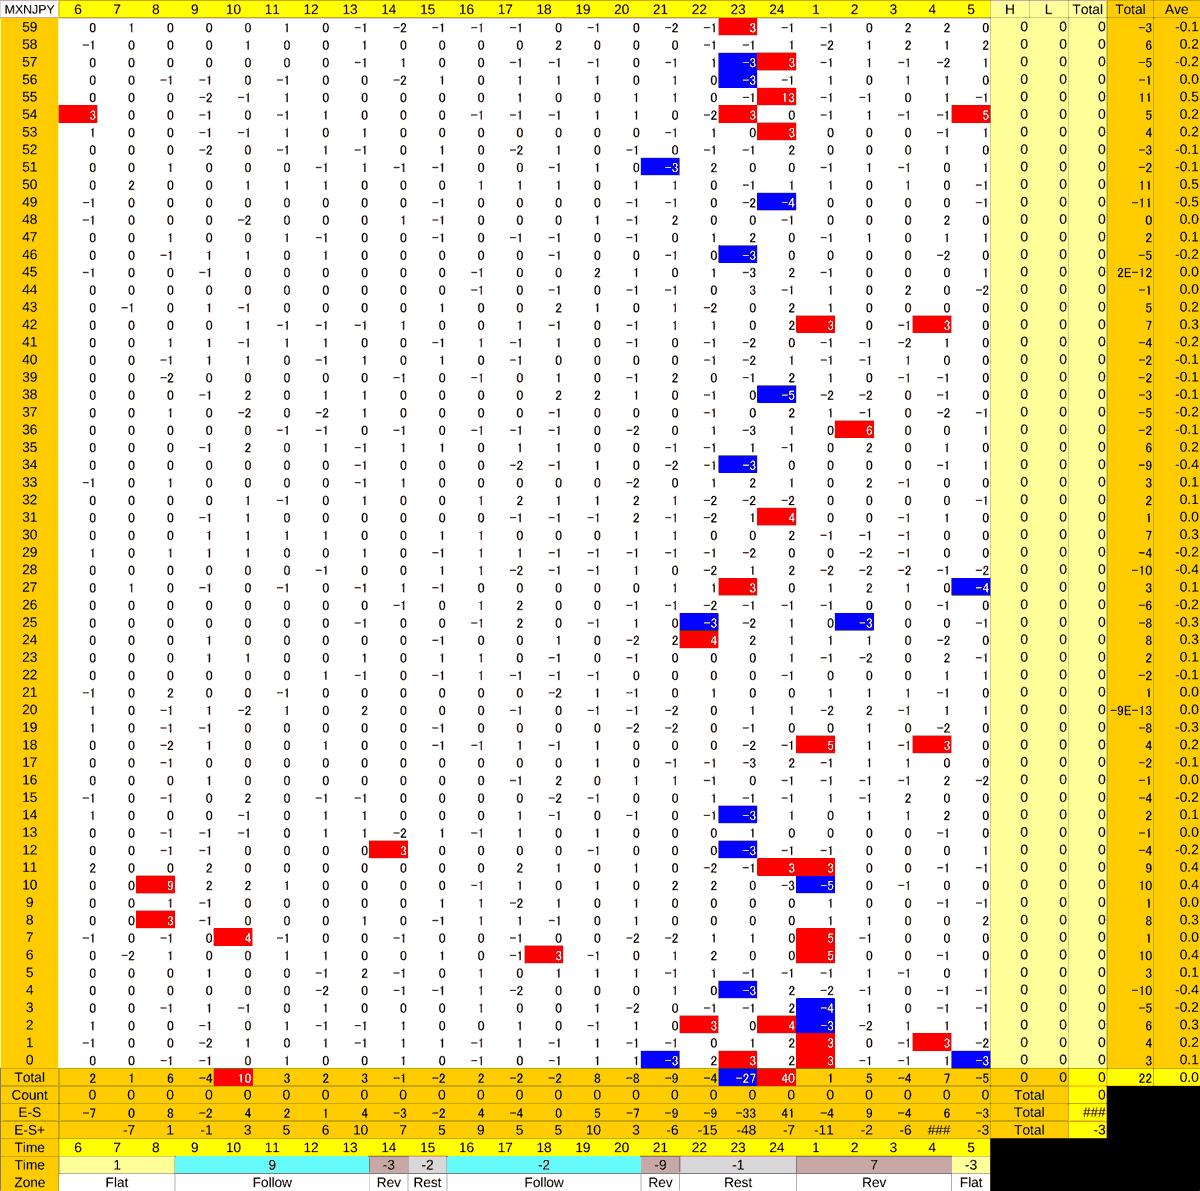 20201230_HS(3)MXNJPY